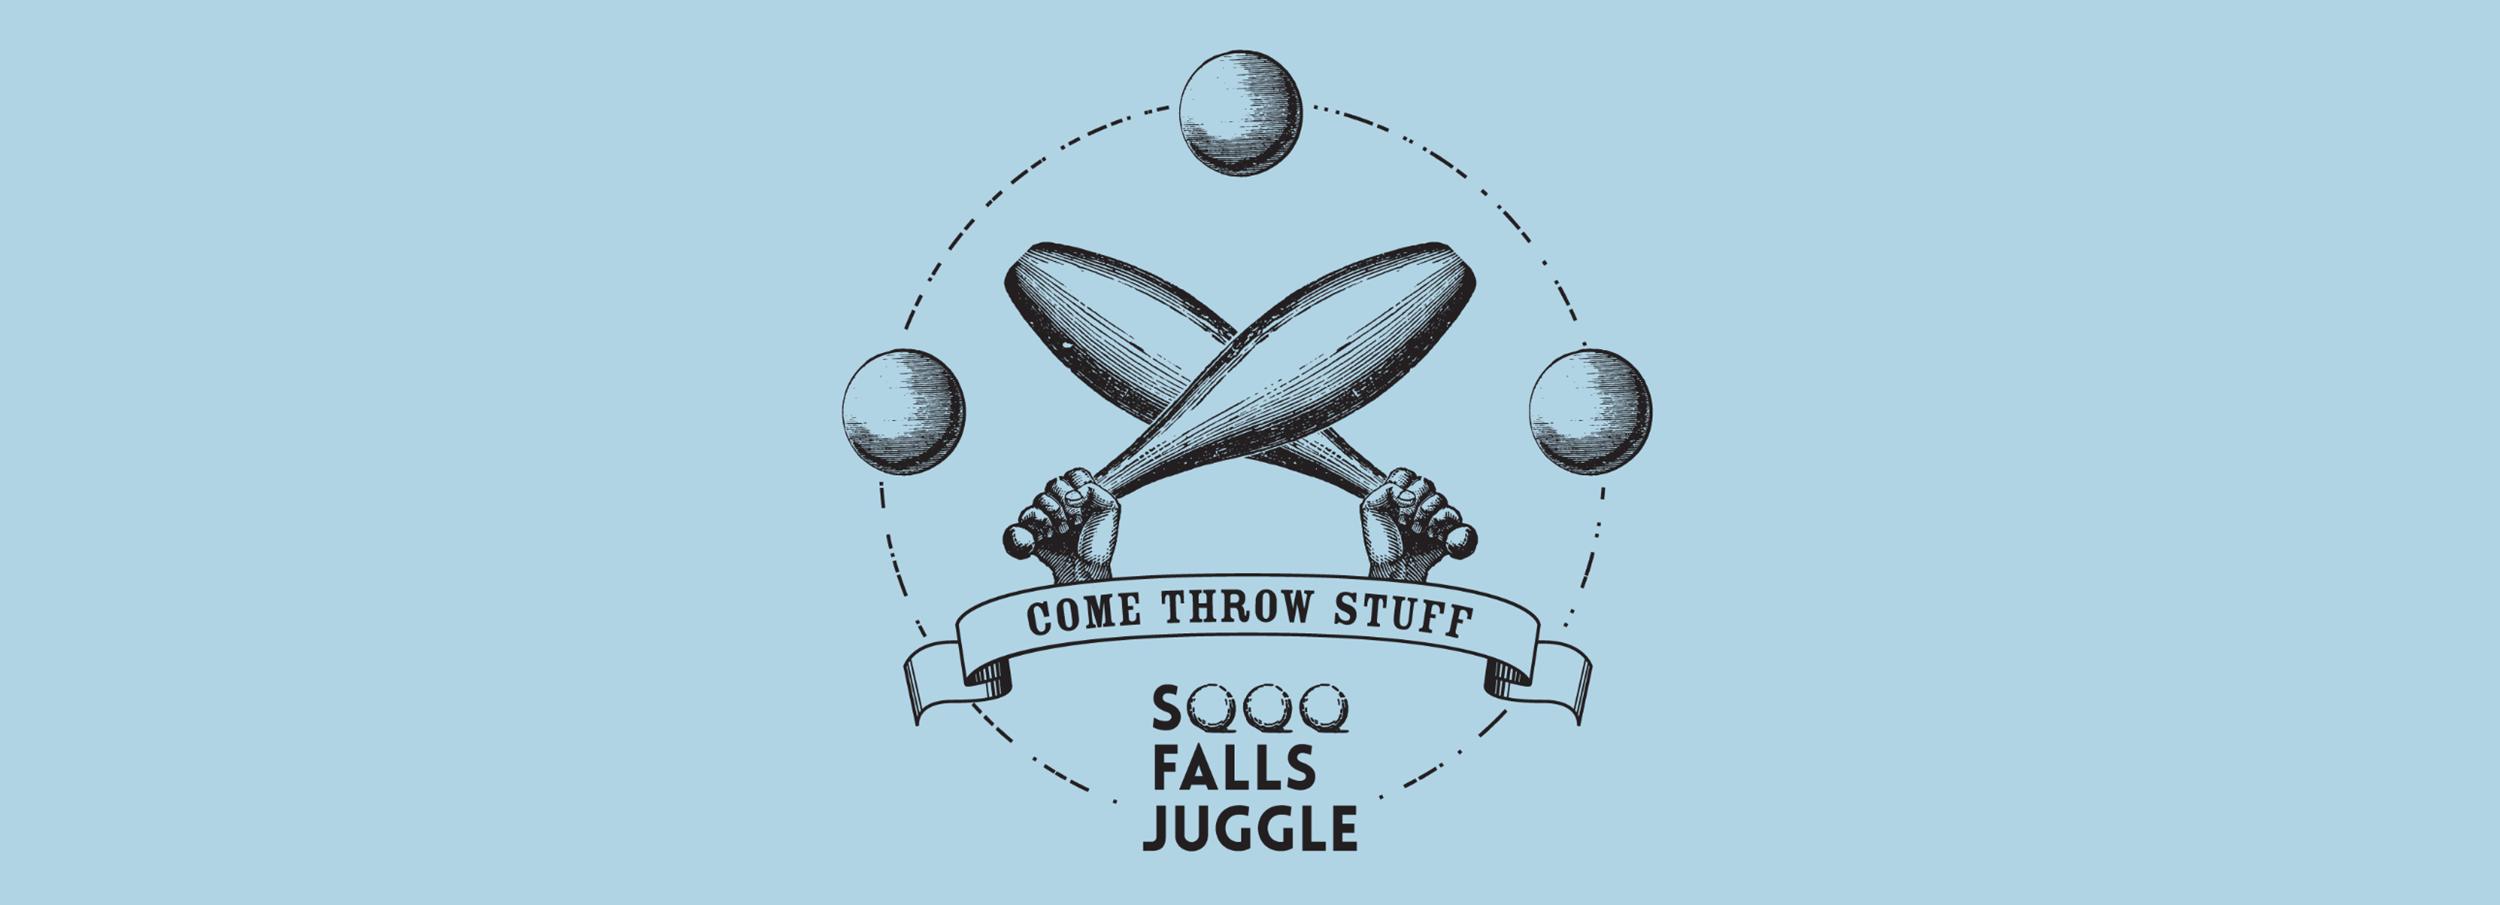 come throw stuff